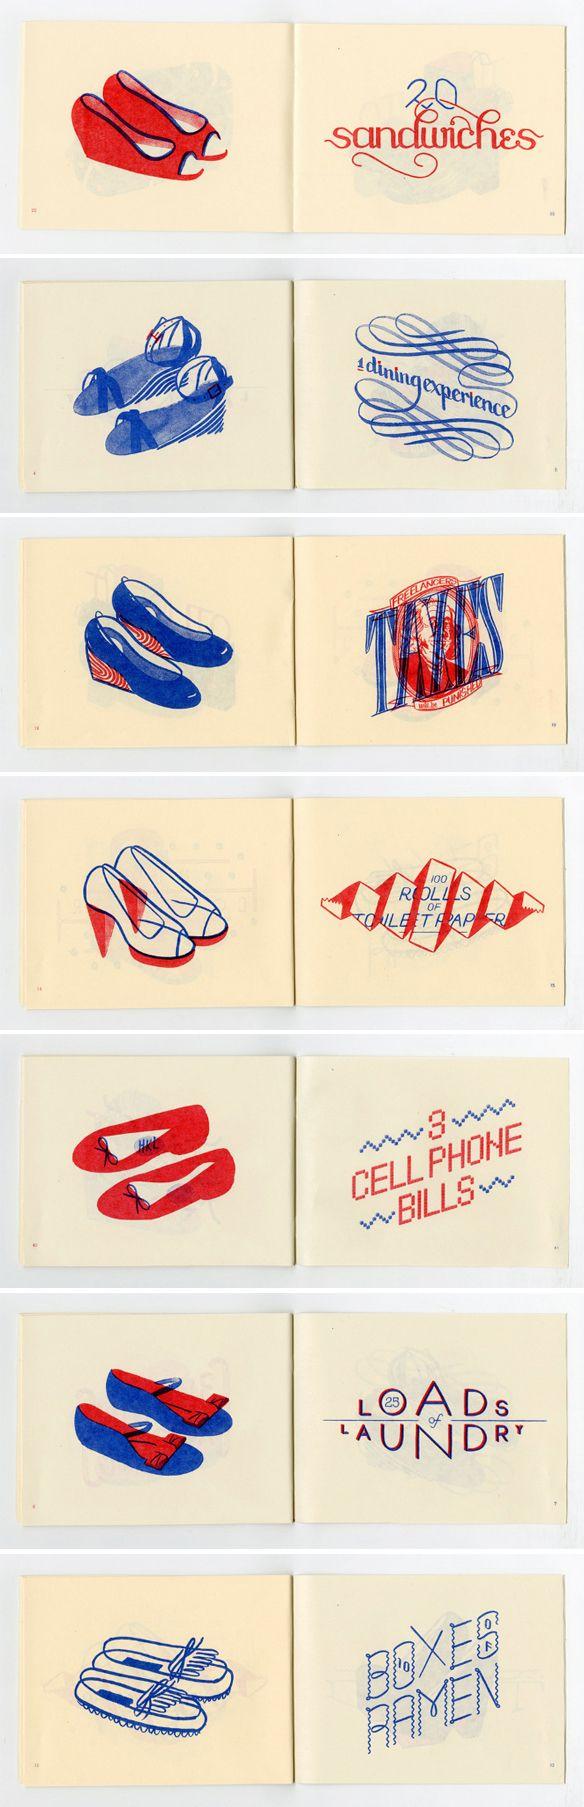 Shoes vs. Bill by hannah k. lee